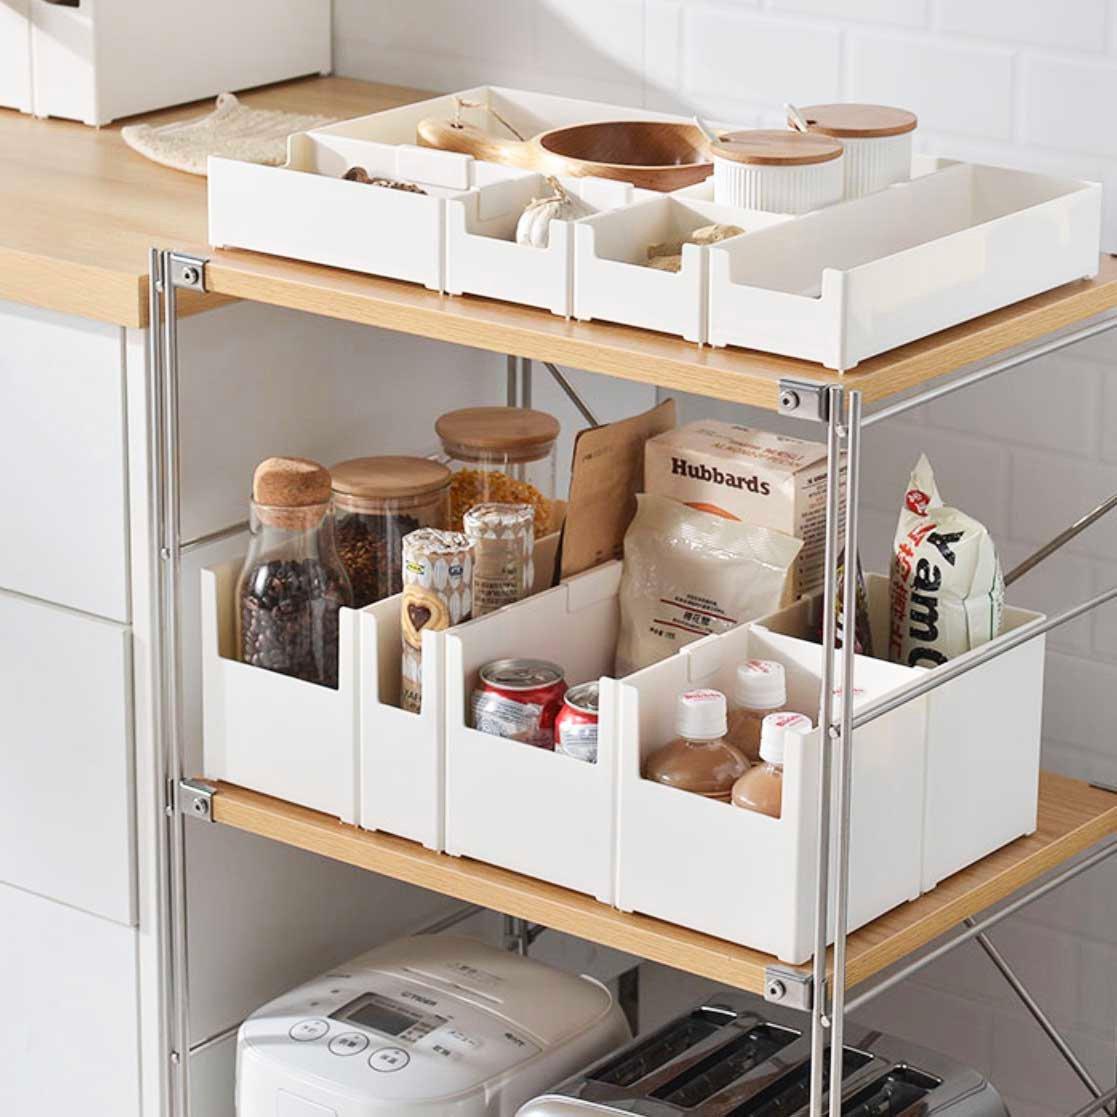 Design Your Own Kitchen & Desk Organizer   Pantry, Table   Style Degree